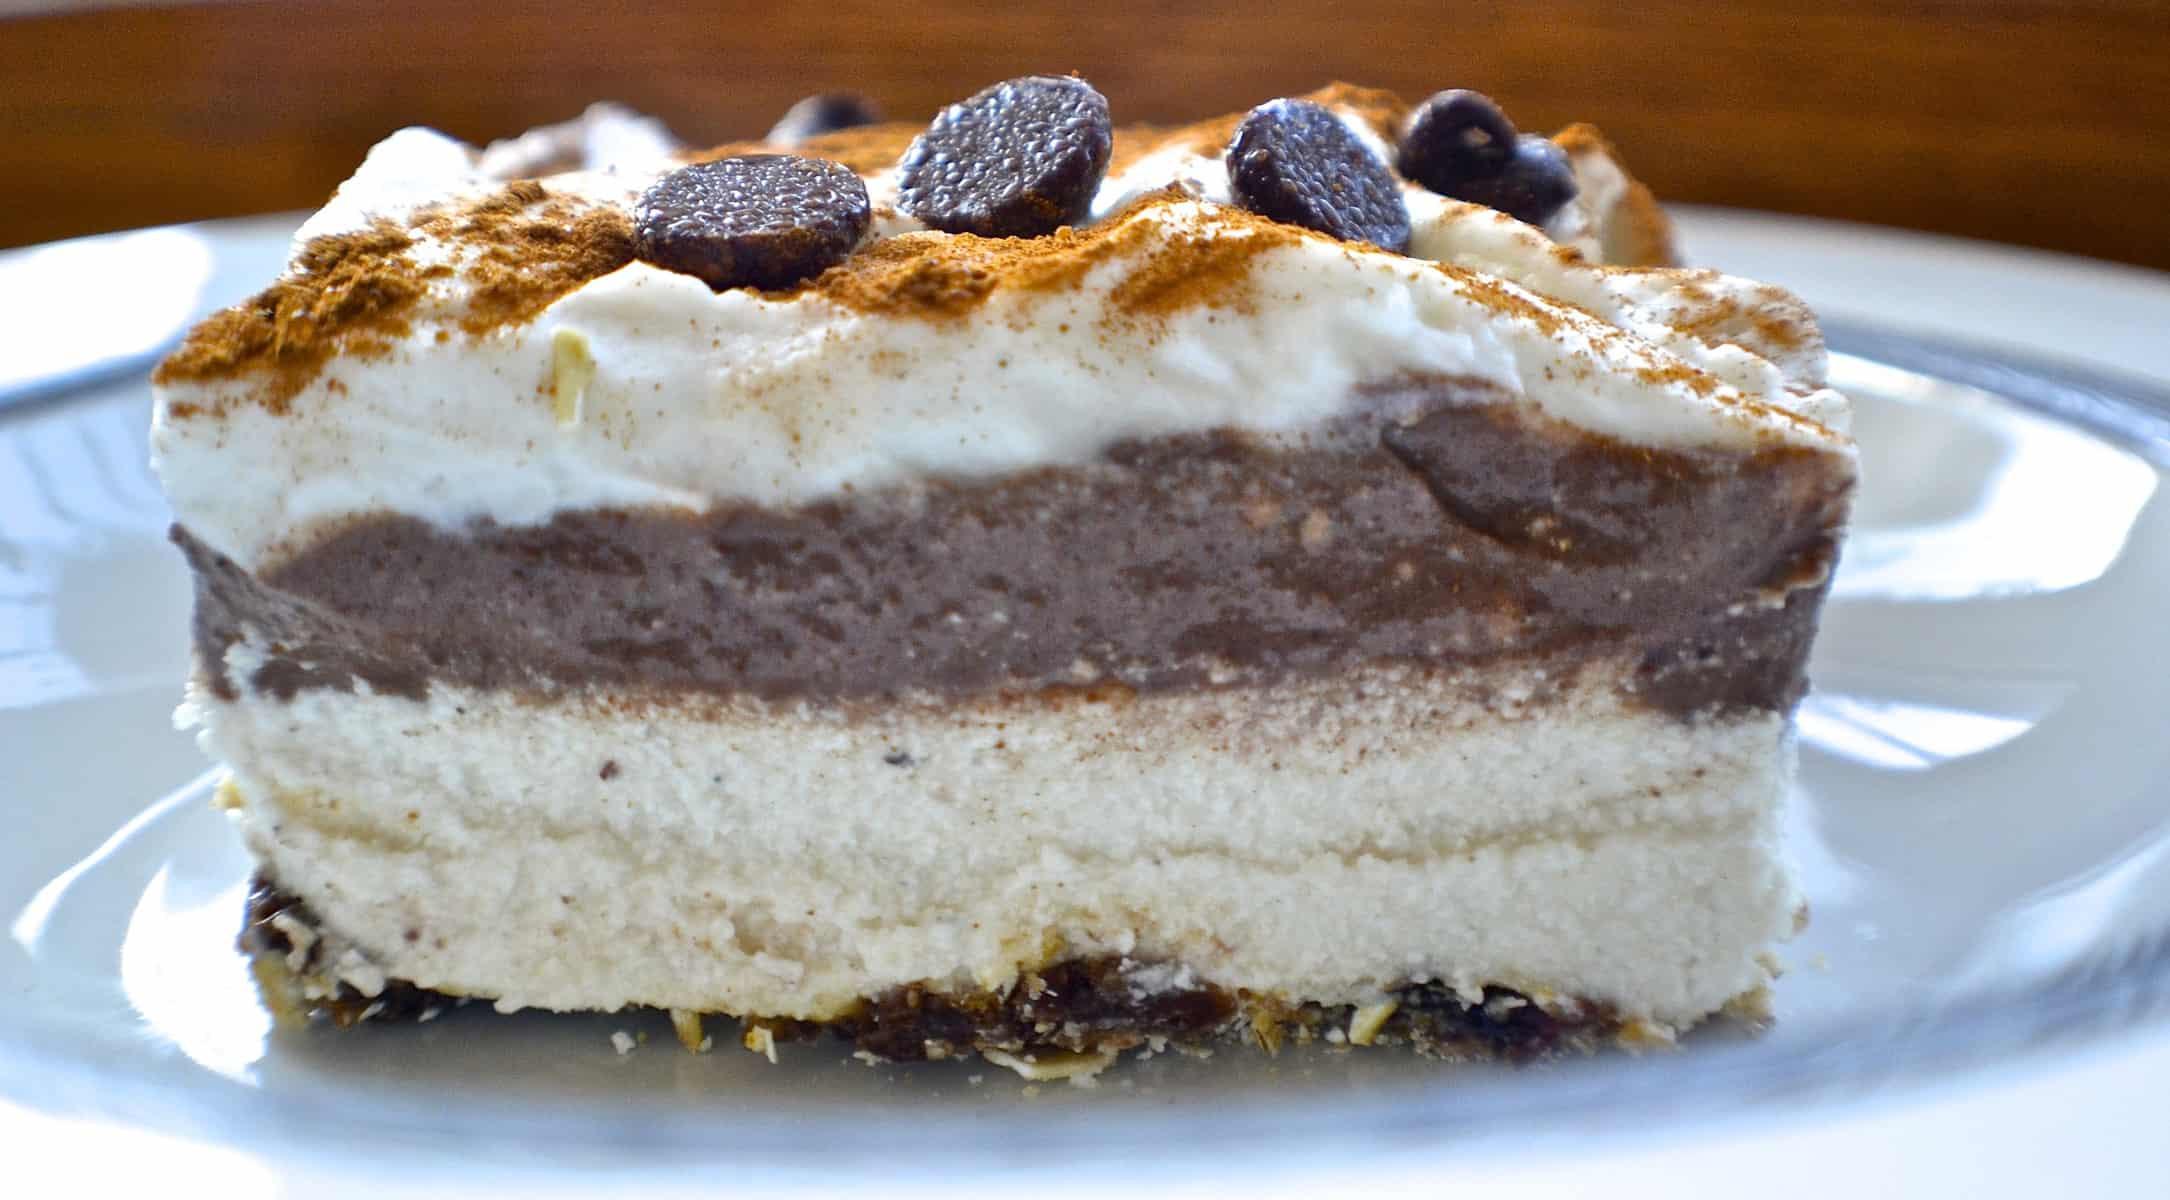 What Is Dessert  The best vegan chocolate dessert recipe ever